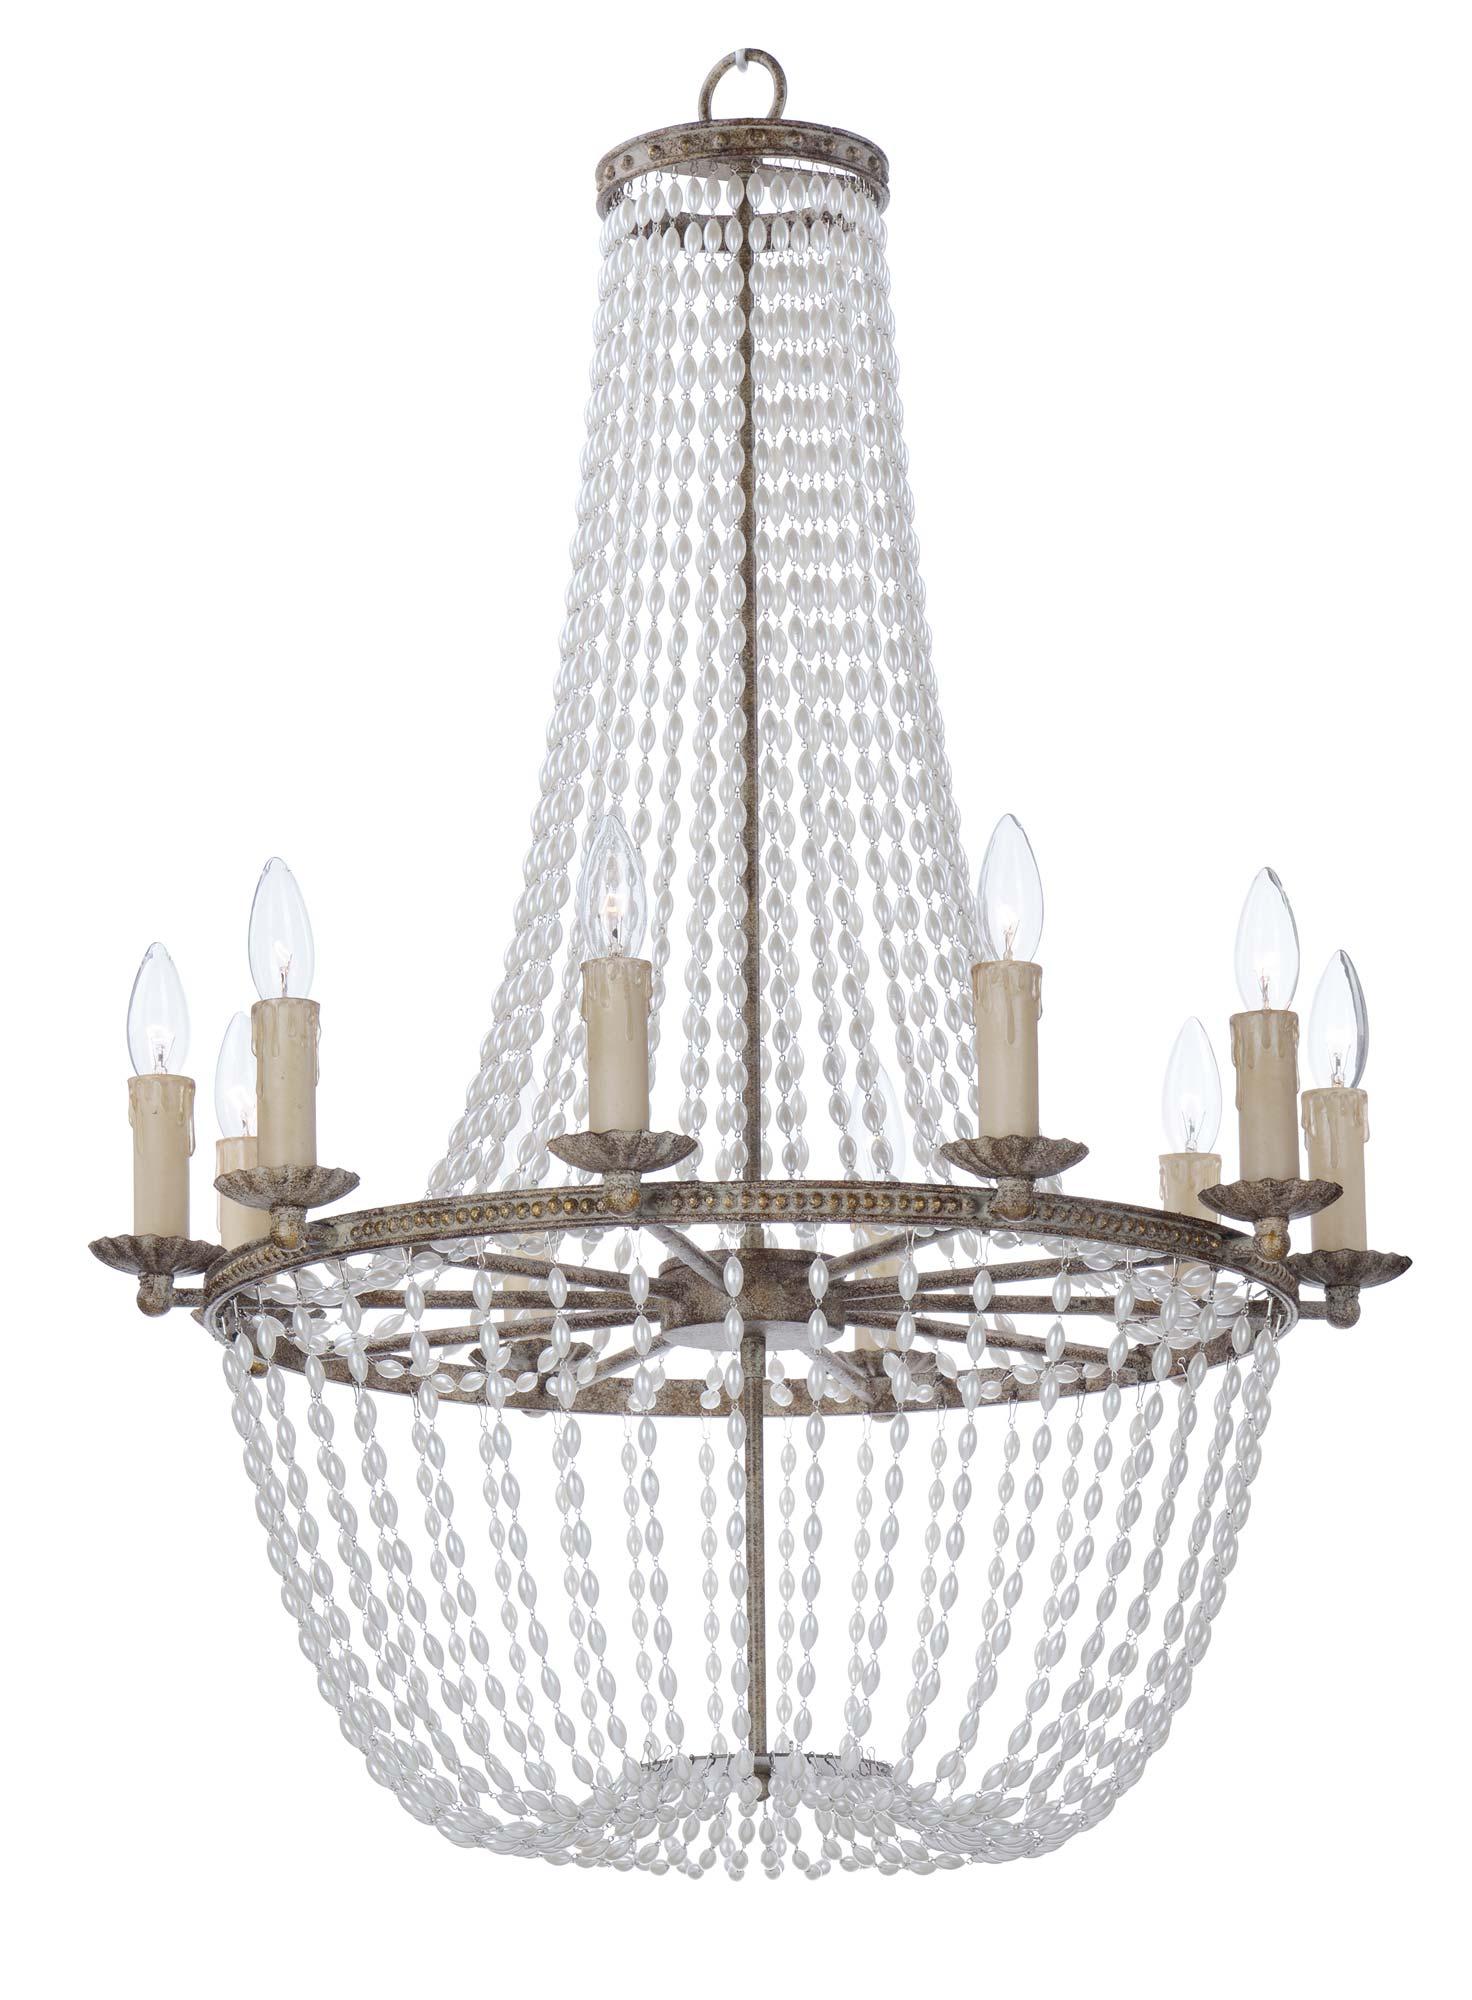 Gisele chandelier by maxim lighting